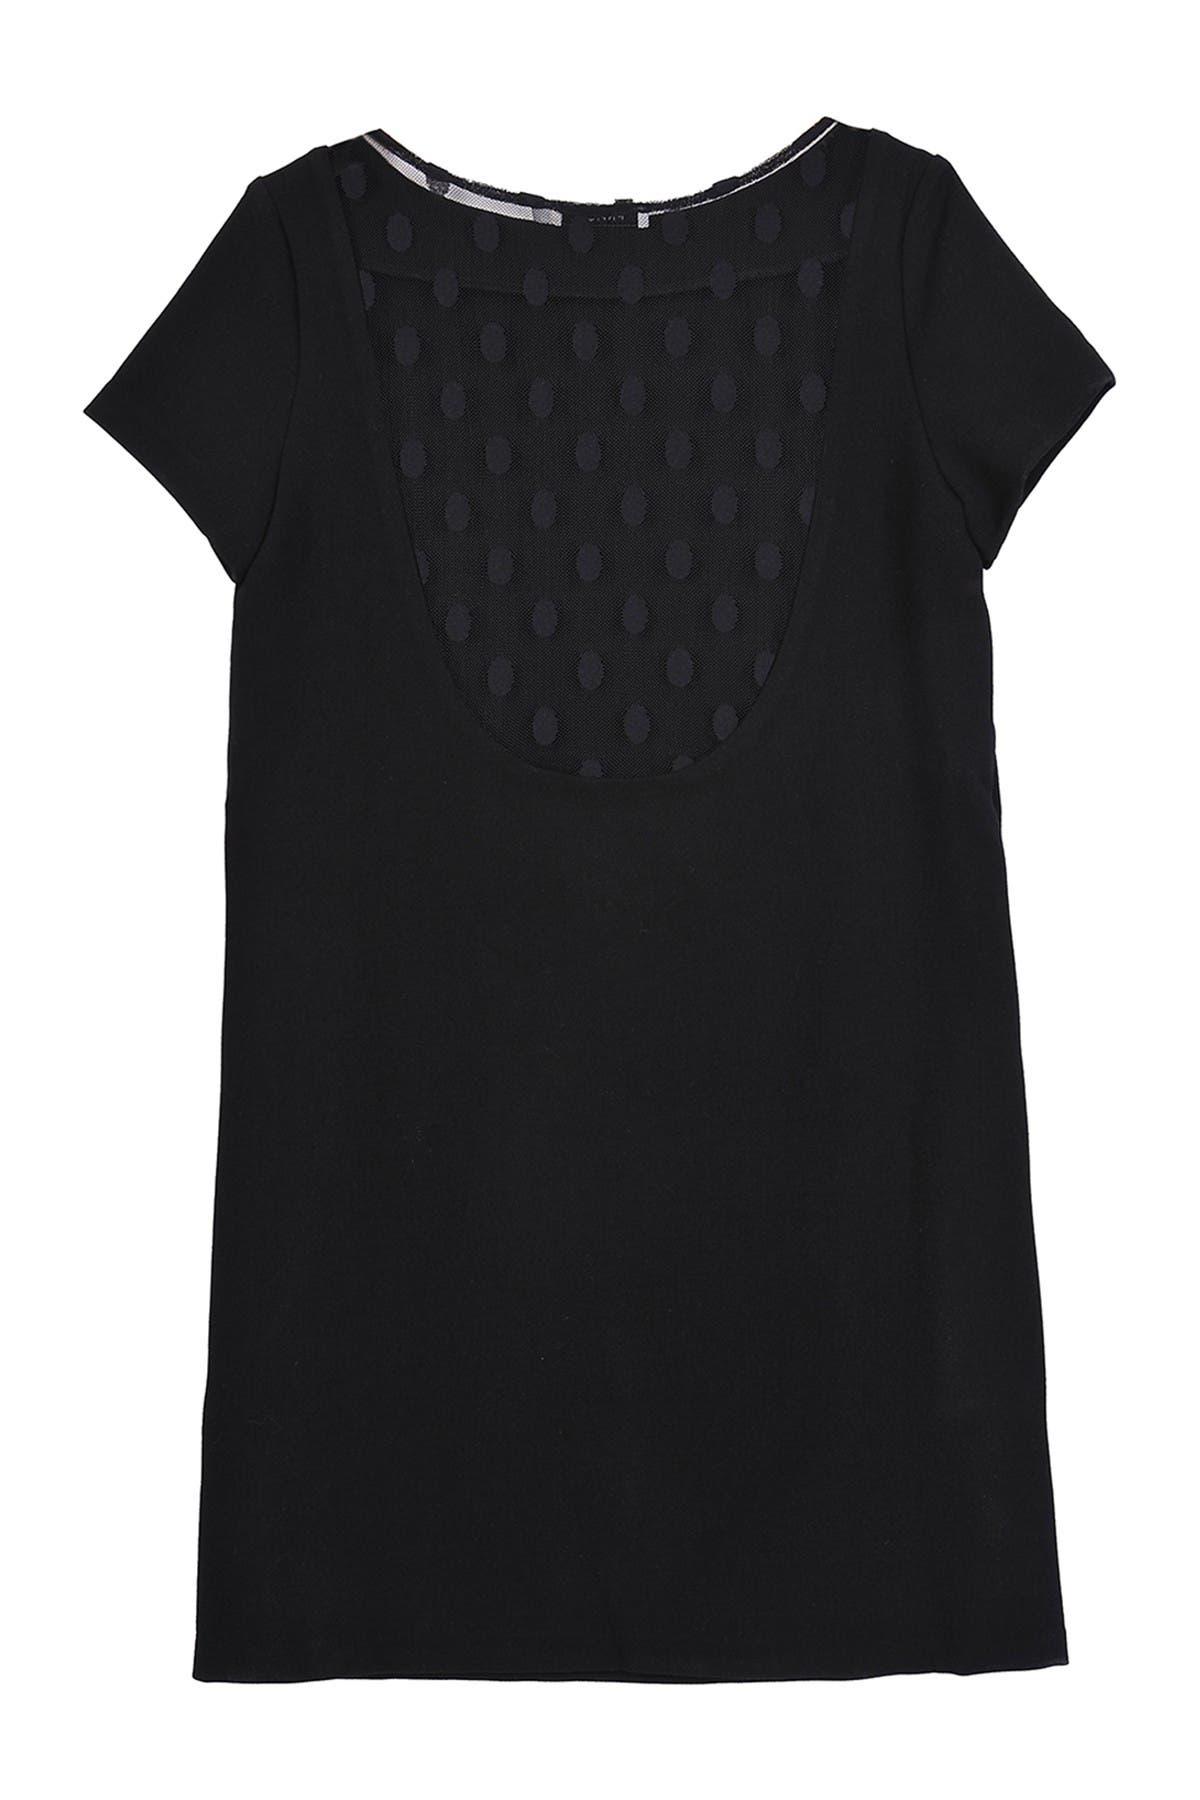 Image of FRNCH 1/4 Sleeveless Shift Short Dress